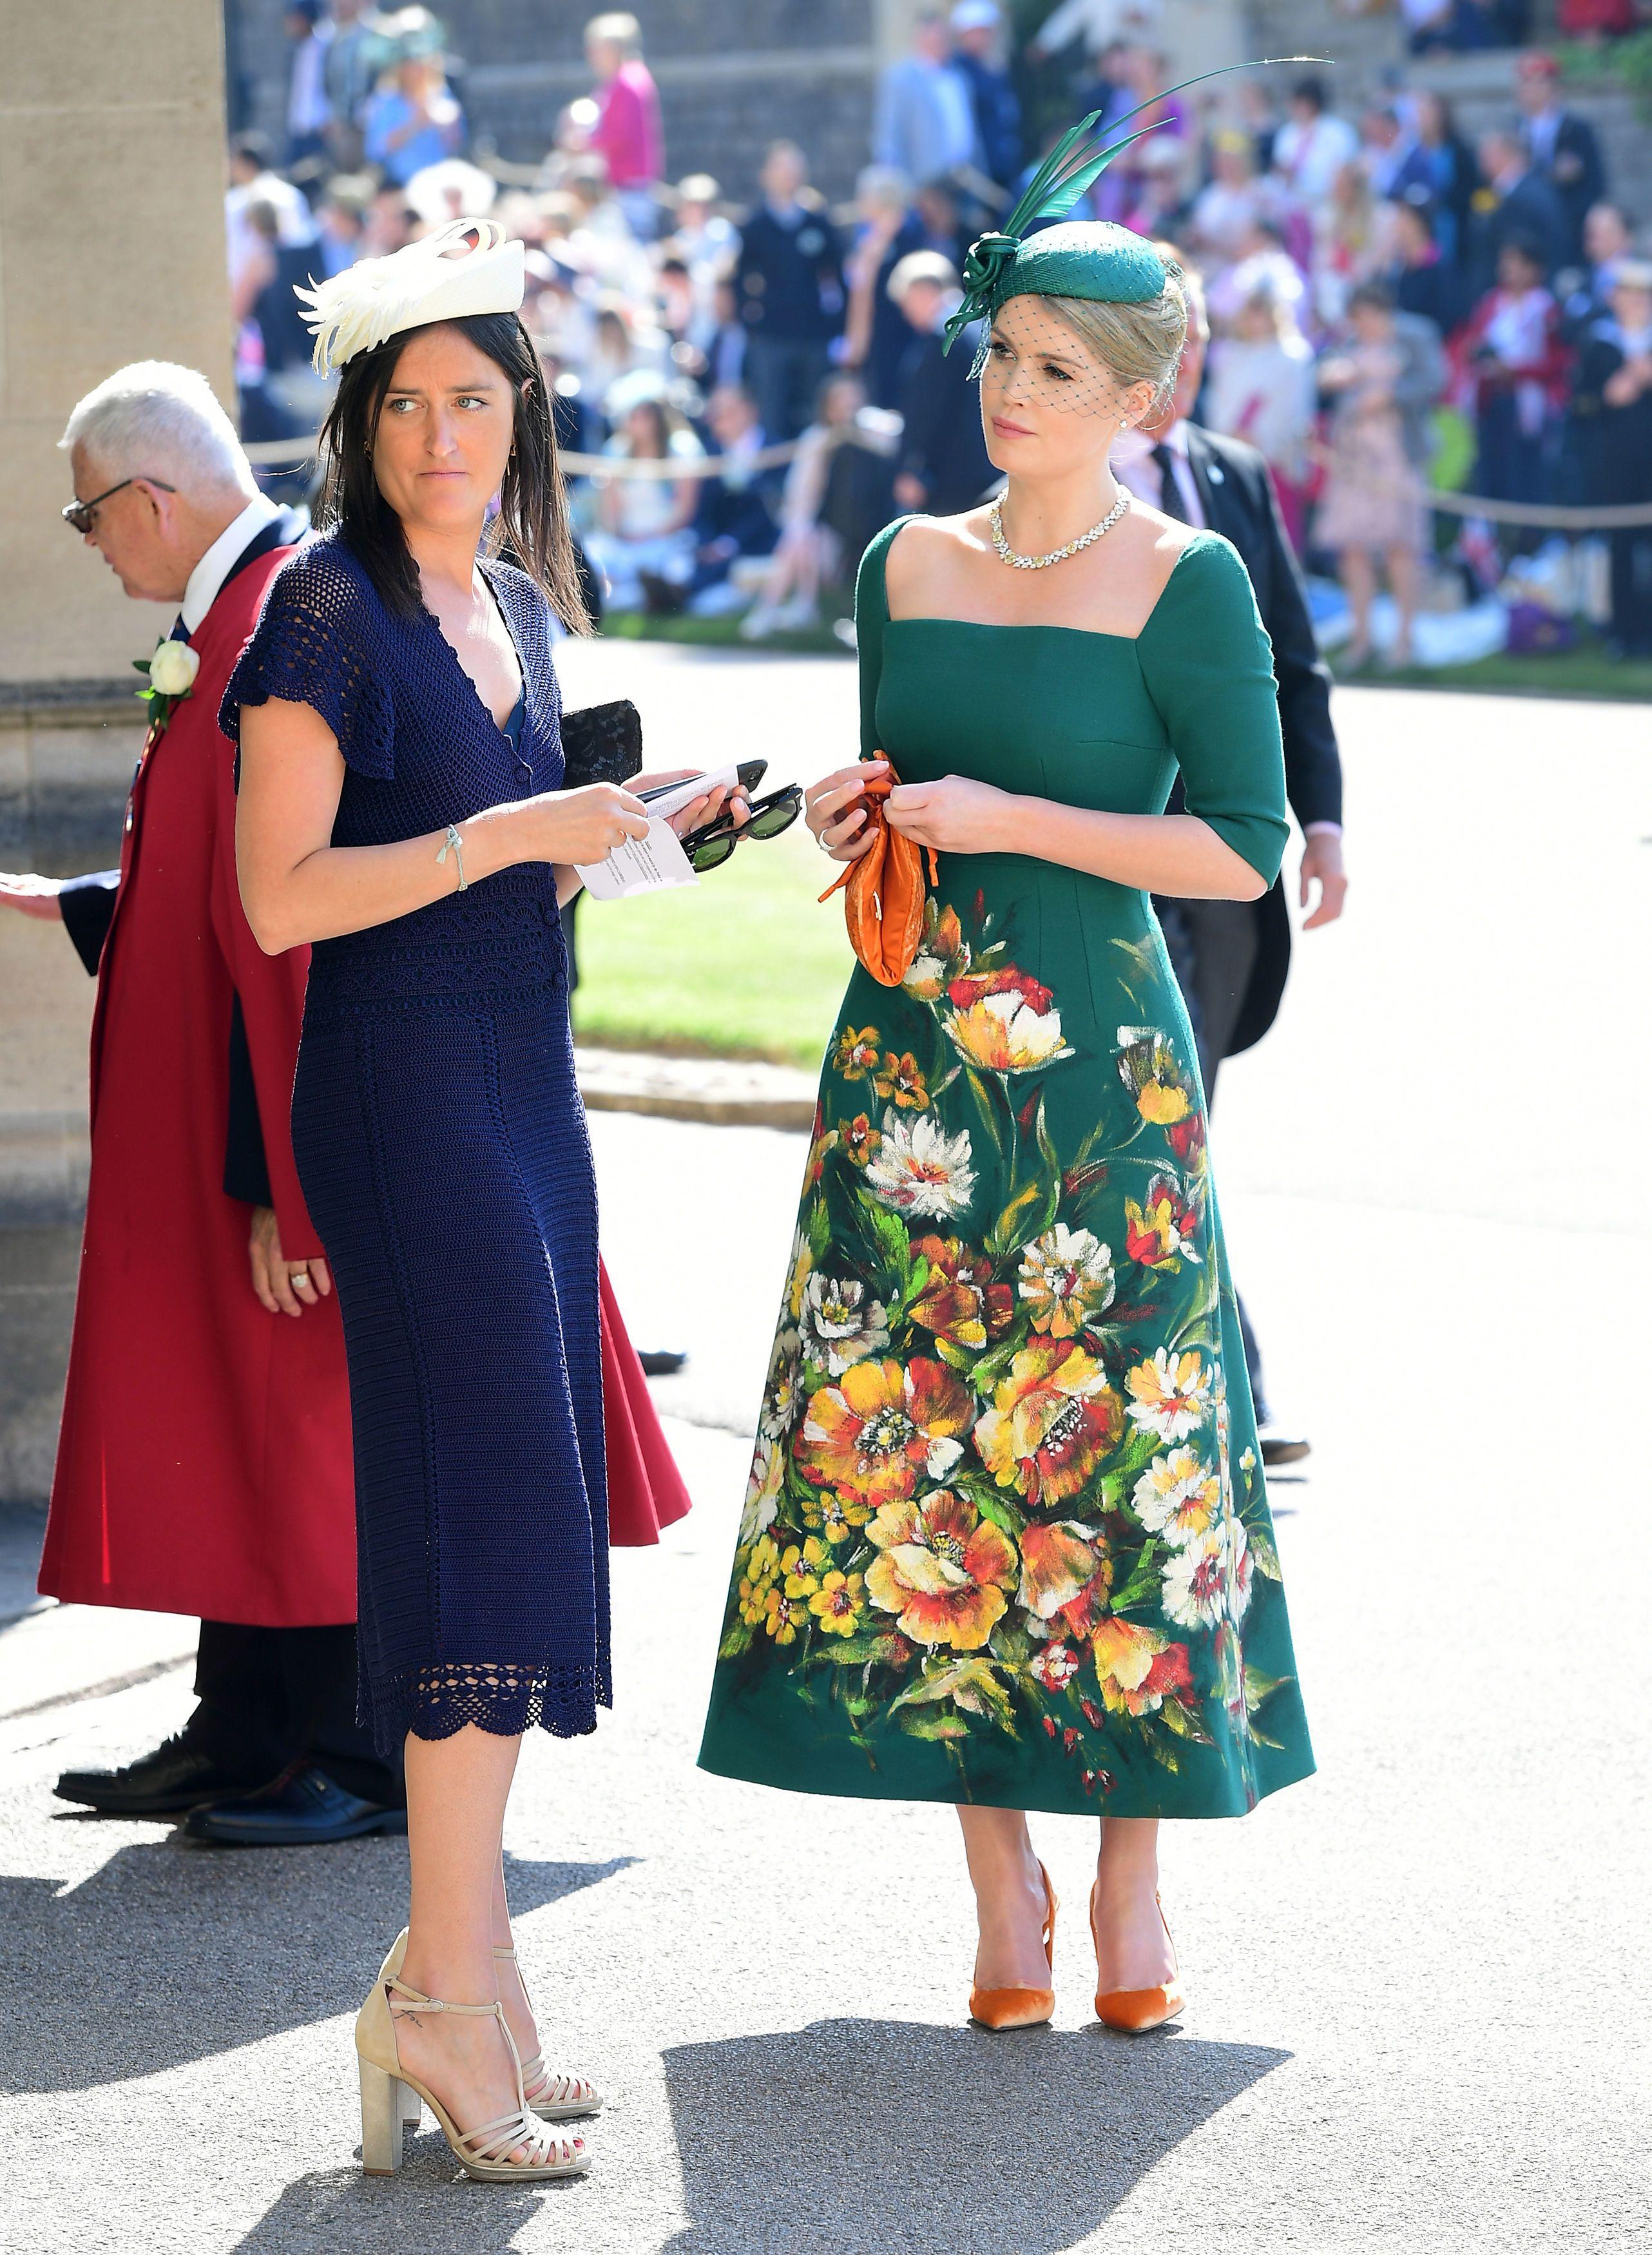 https://hips.hearstapps.com/hmg-prod.s3.amazonaws.com/images/royal-wedding-2018-princess-diana-niece-lady-kitty-spencer-1526723747.jpg